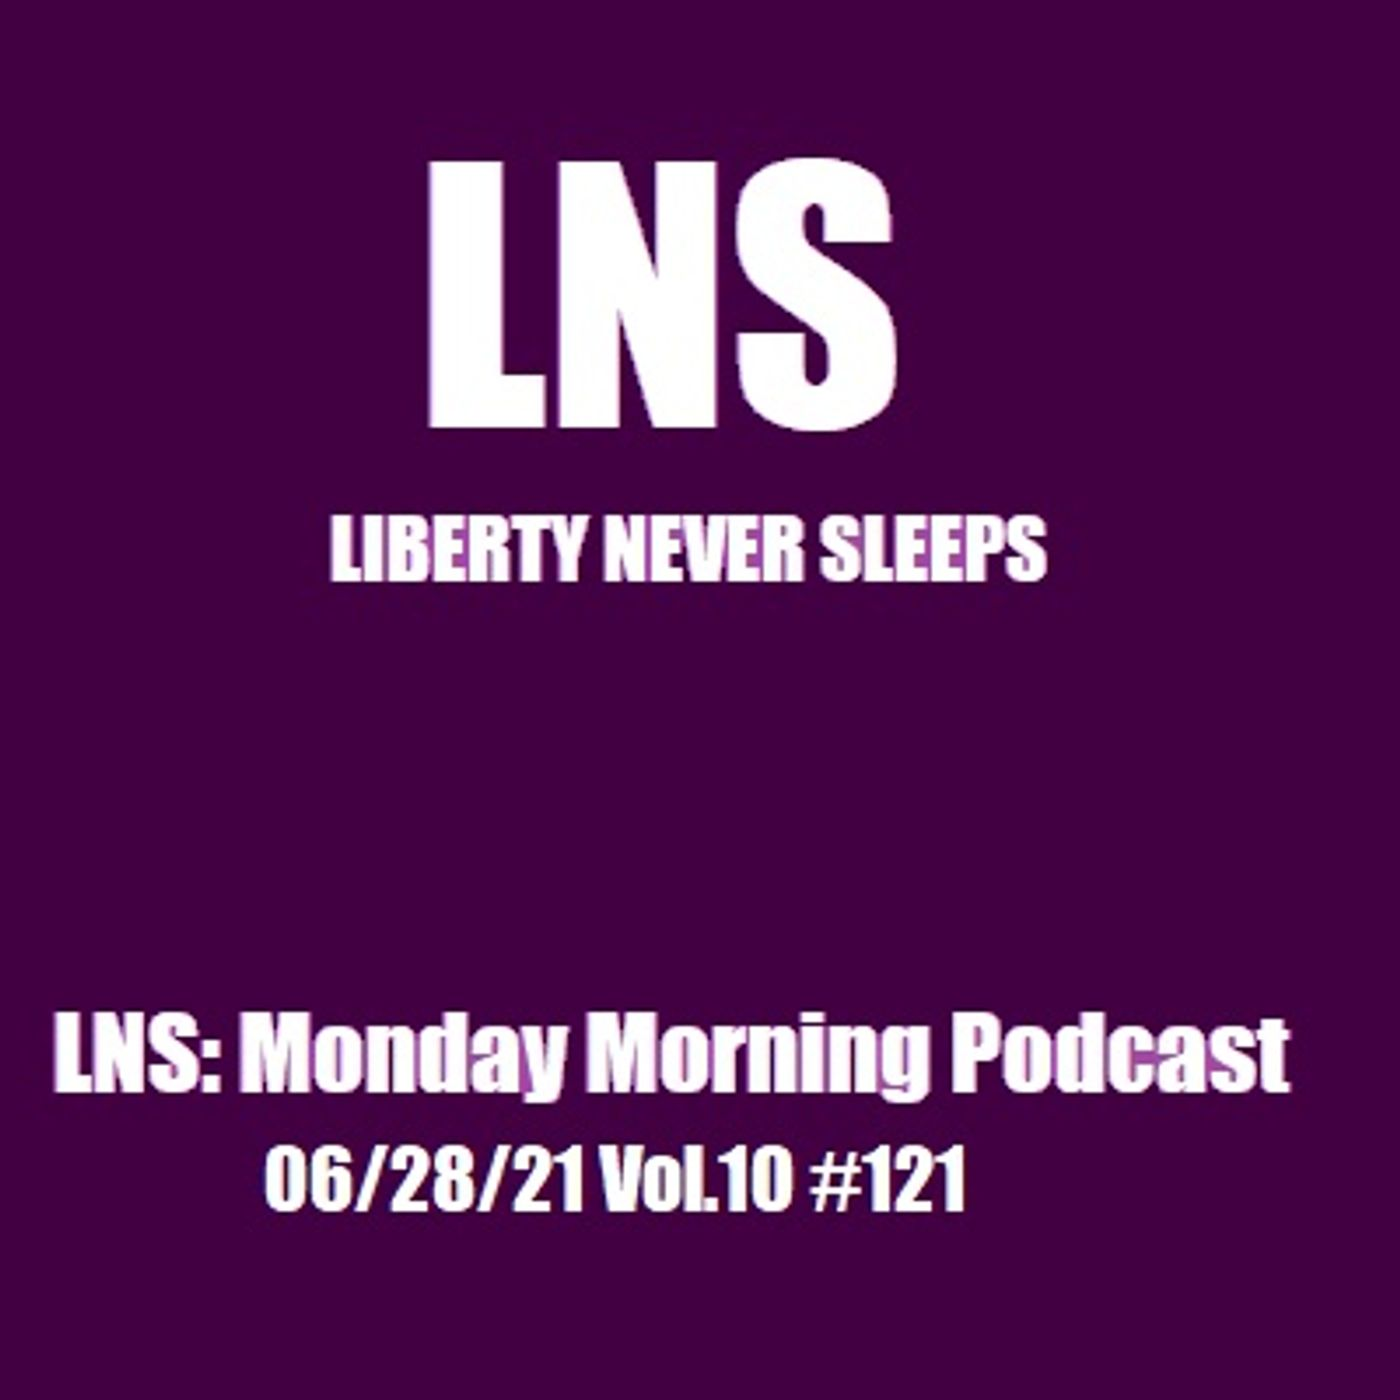 LNS: Monday Morning Podcast 06/28/21 Vol.10 #121